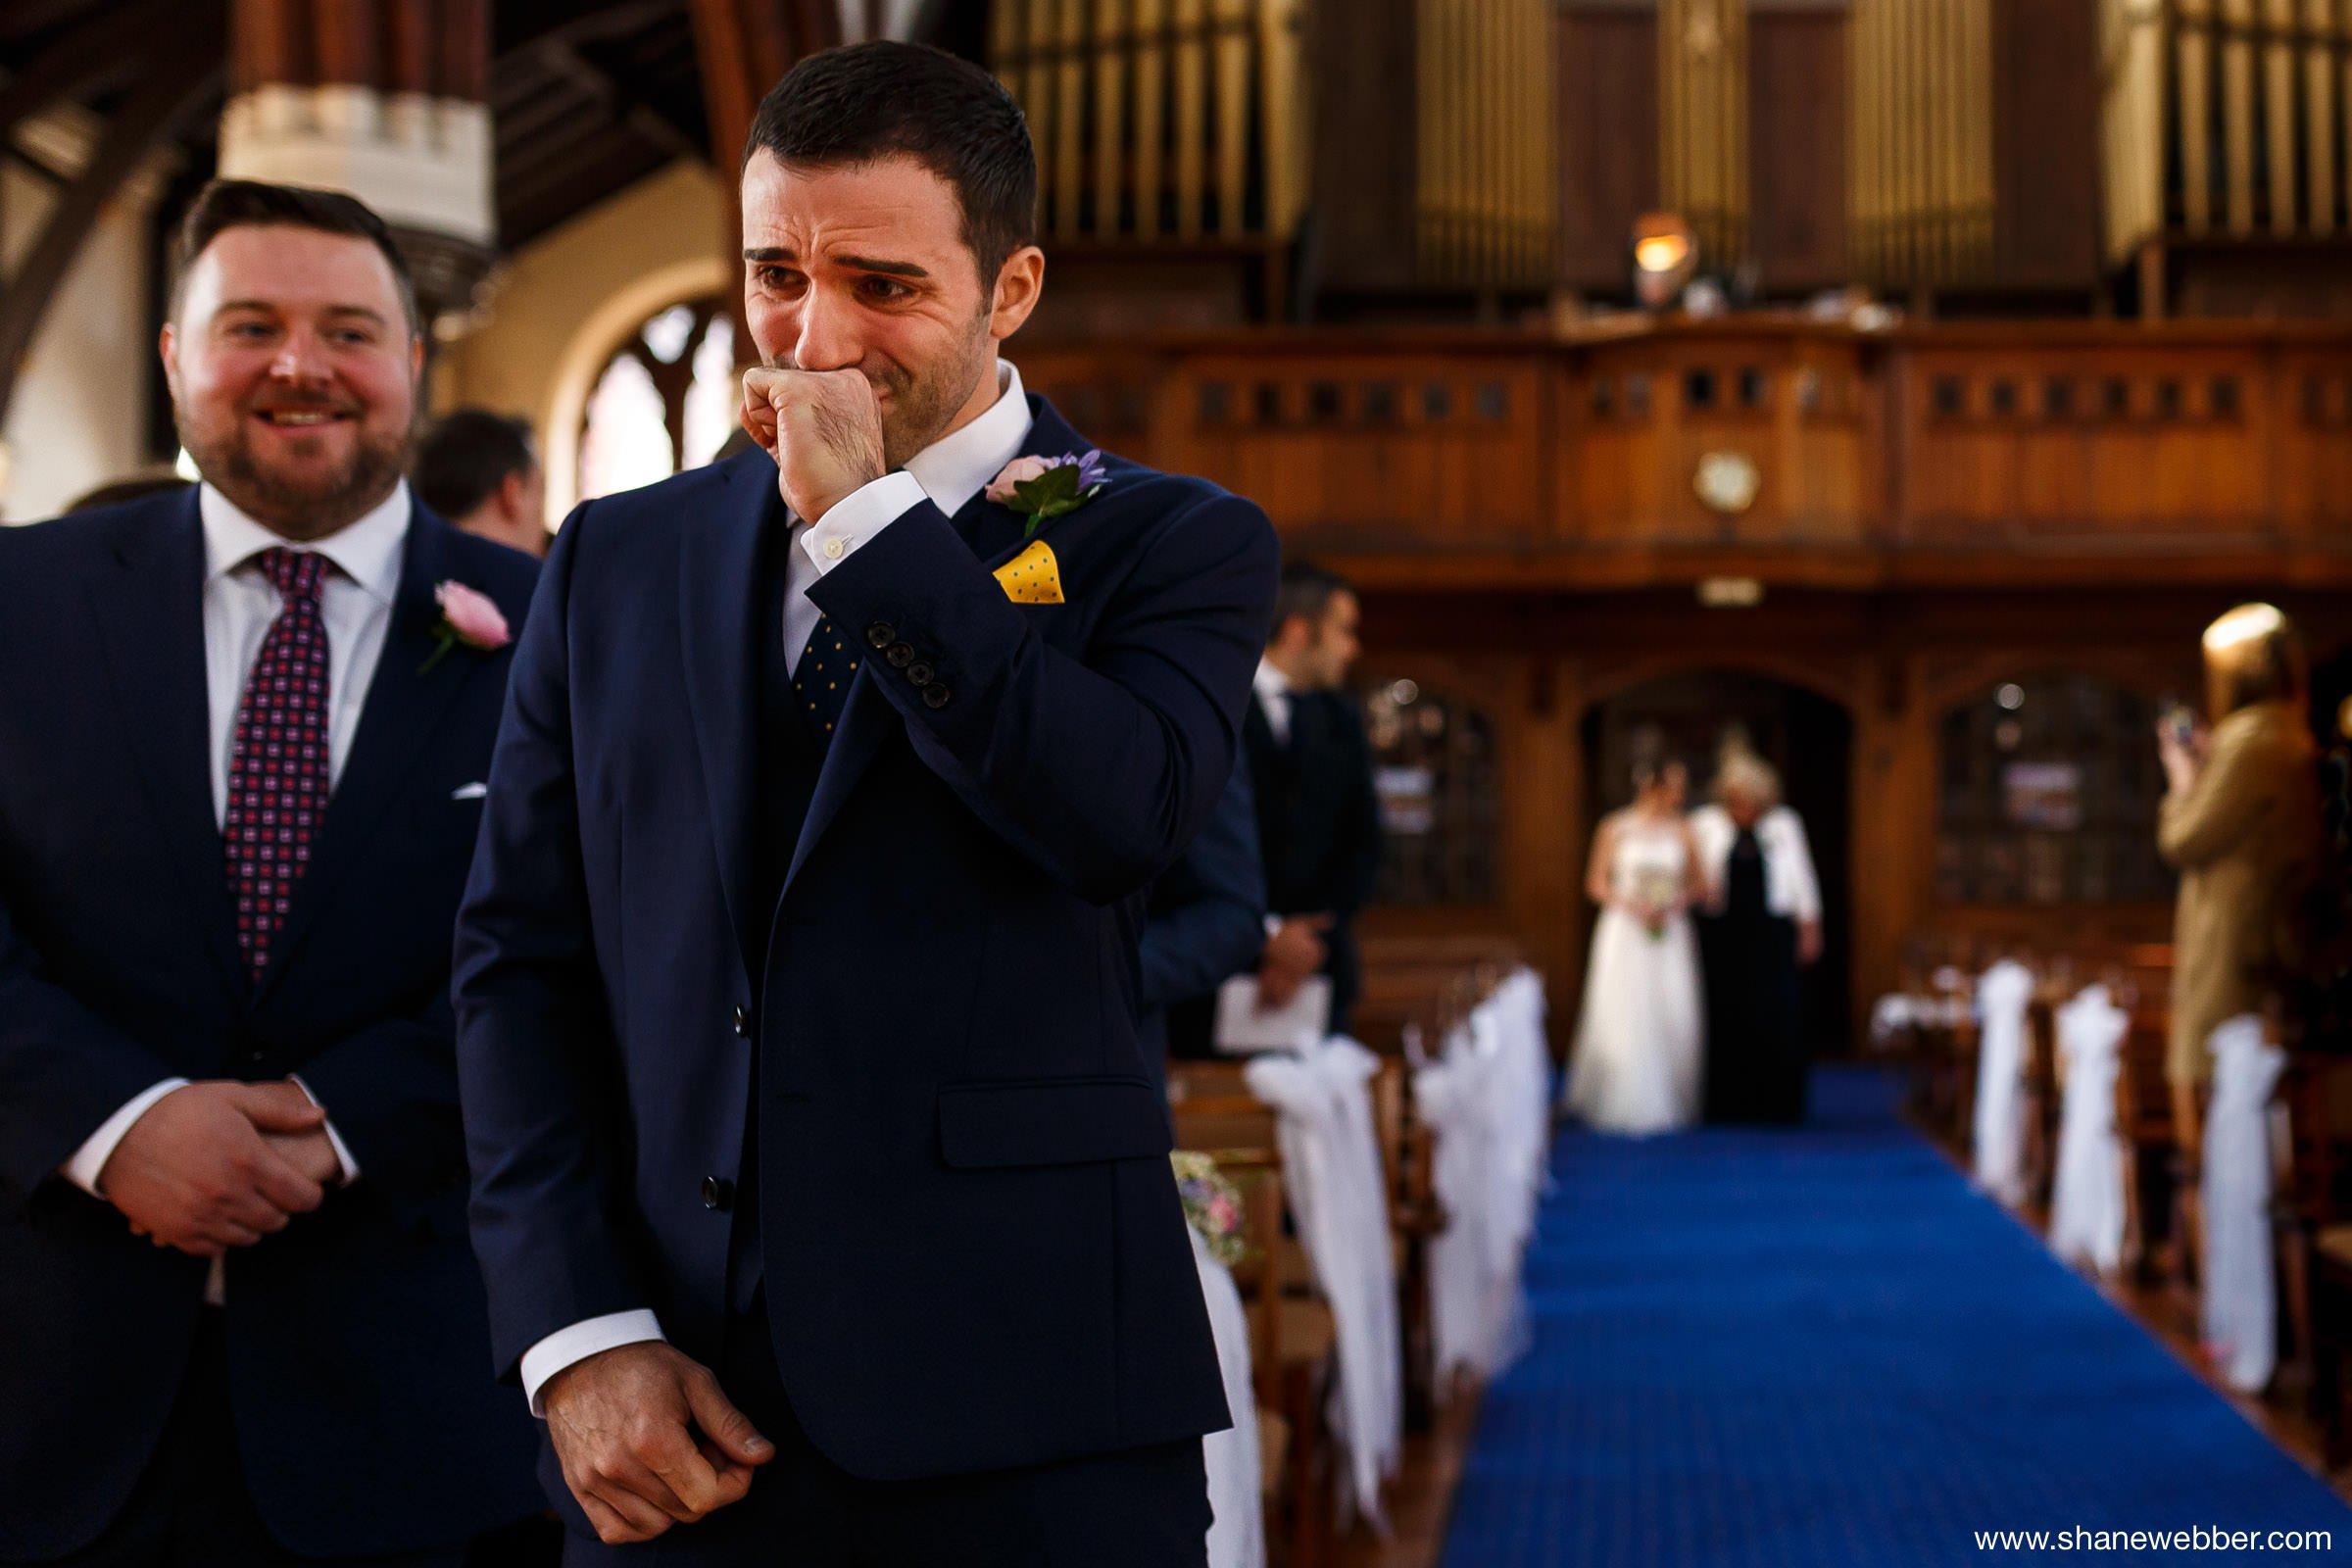 Crying groom at wedding